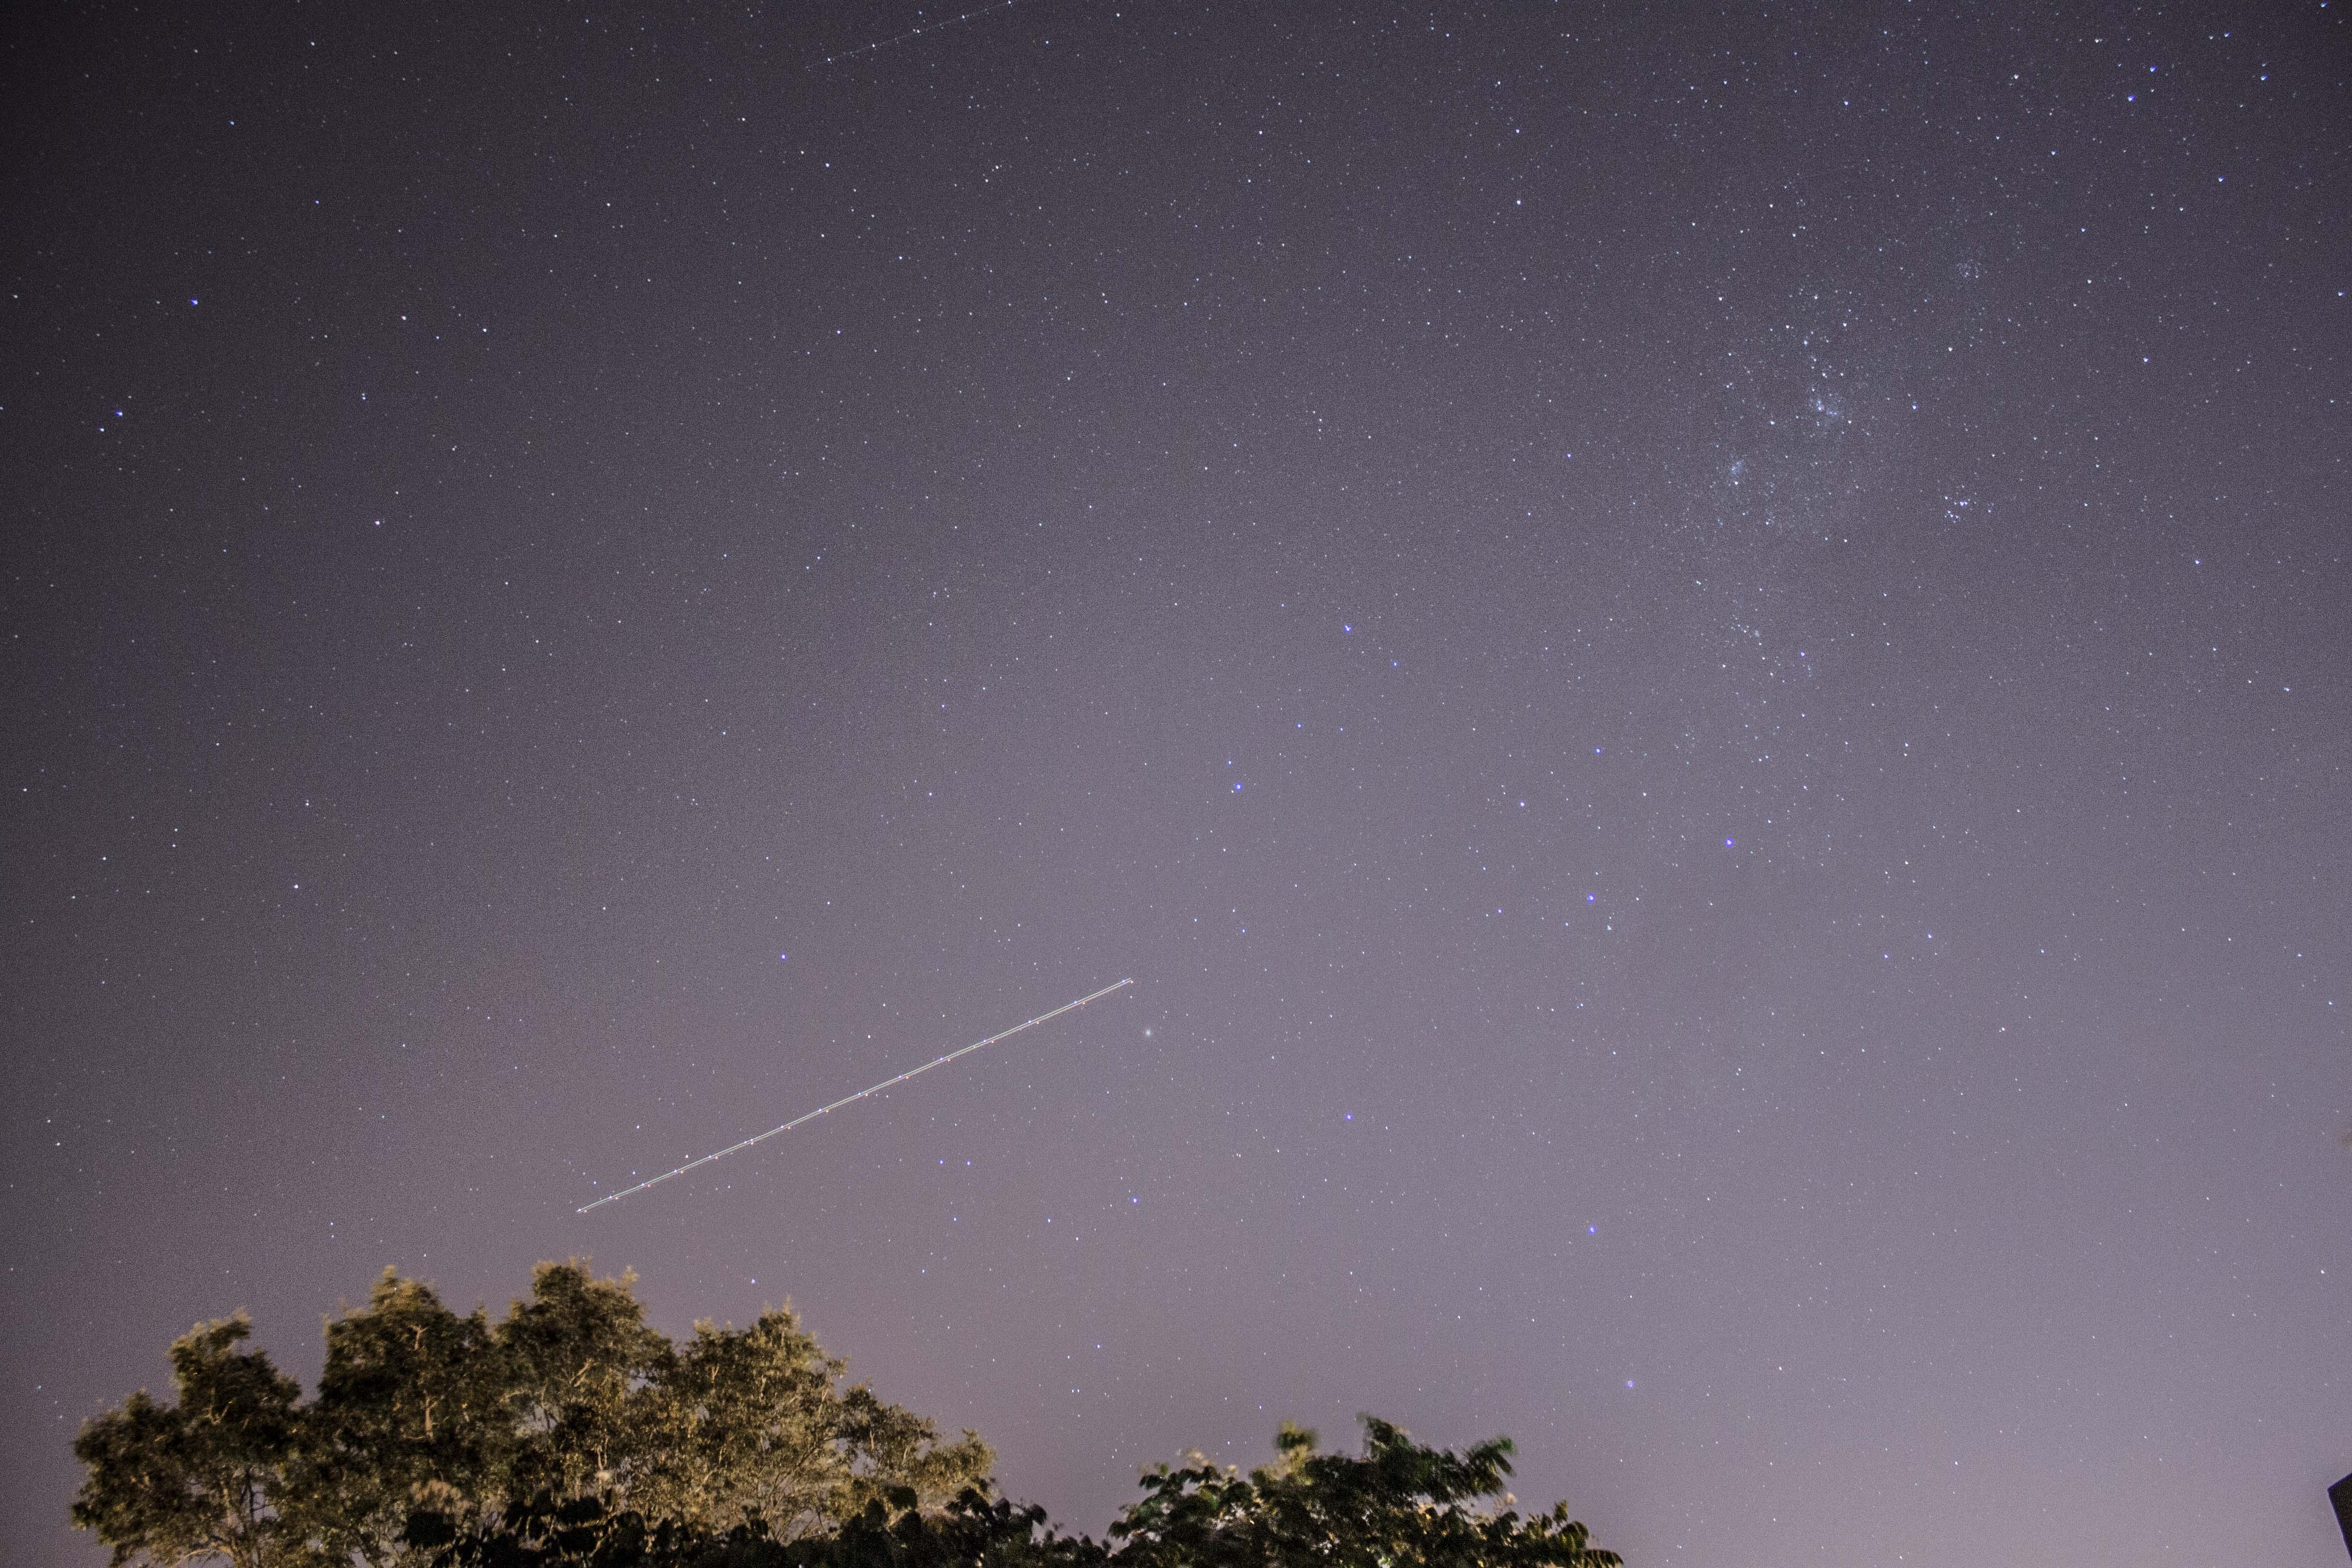 Shooting Star, Nature, Night, Shooting, Sky, HQ Photo